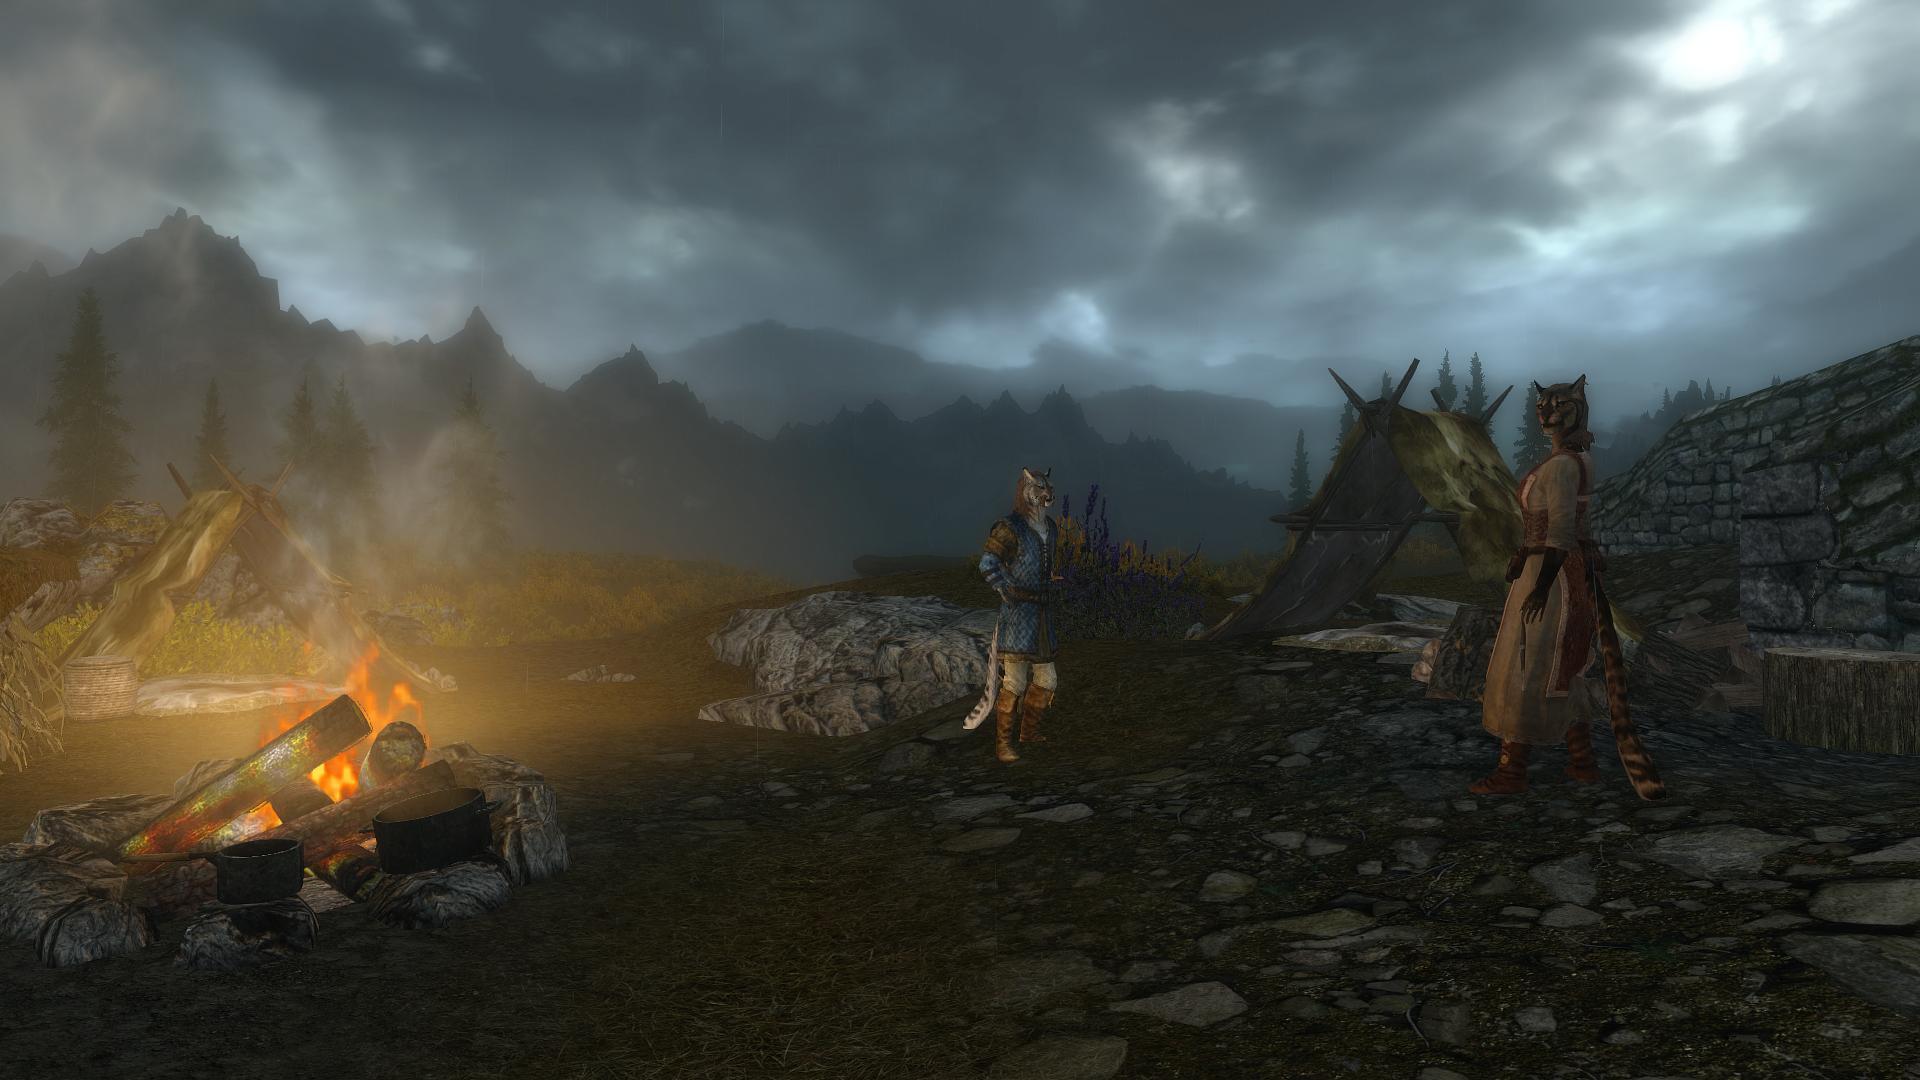 000212.Jpg - Elder Scrolls 5: Skyrim, the